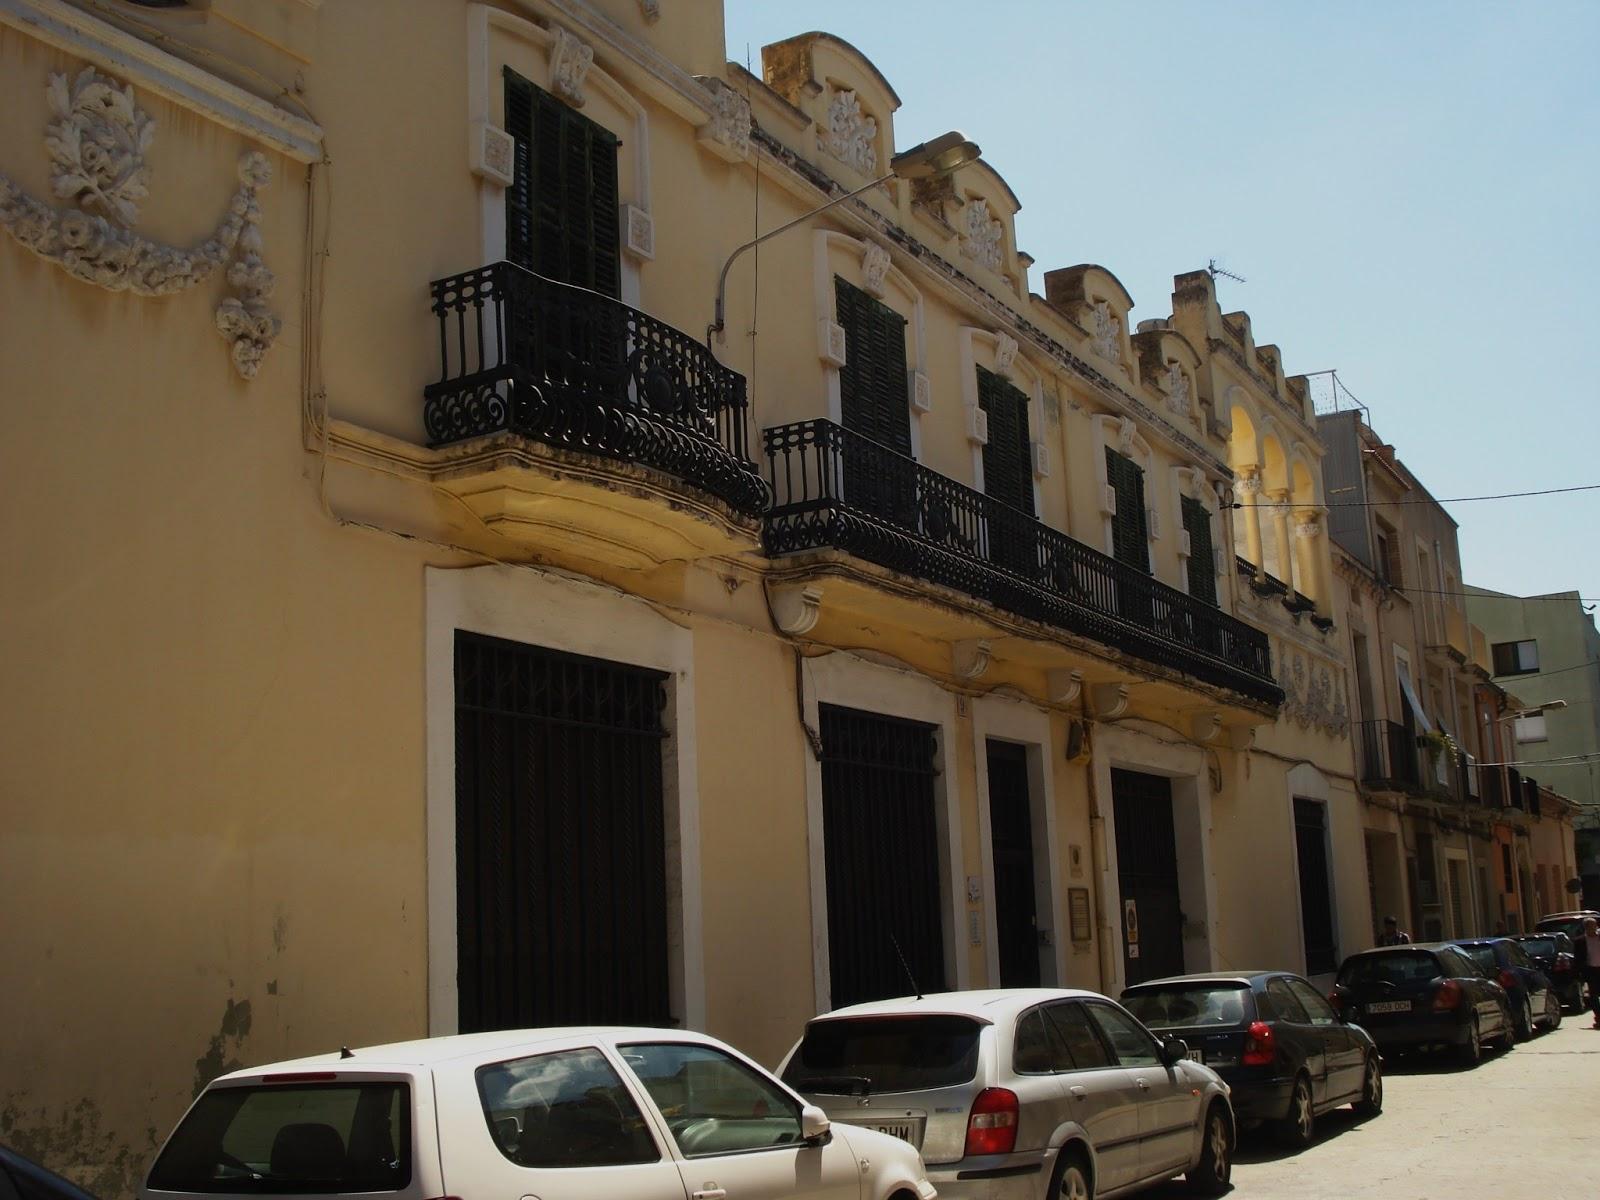 Tot son punts de vista la casa antoni galt s main de for Morato vilafranca